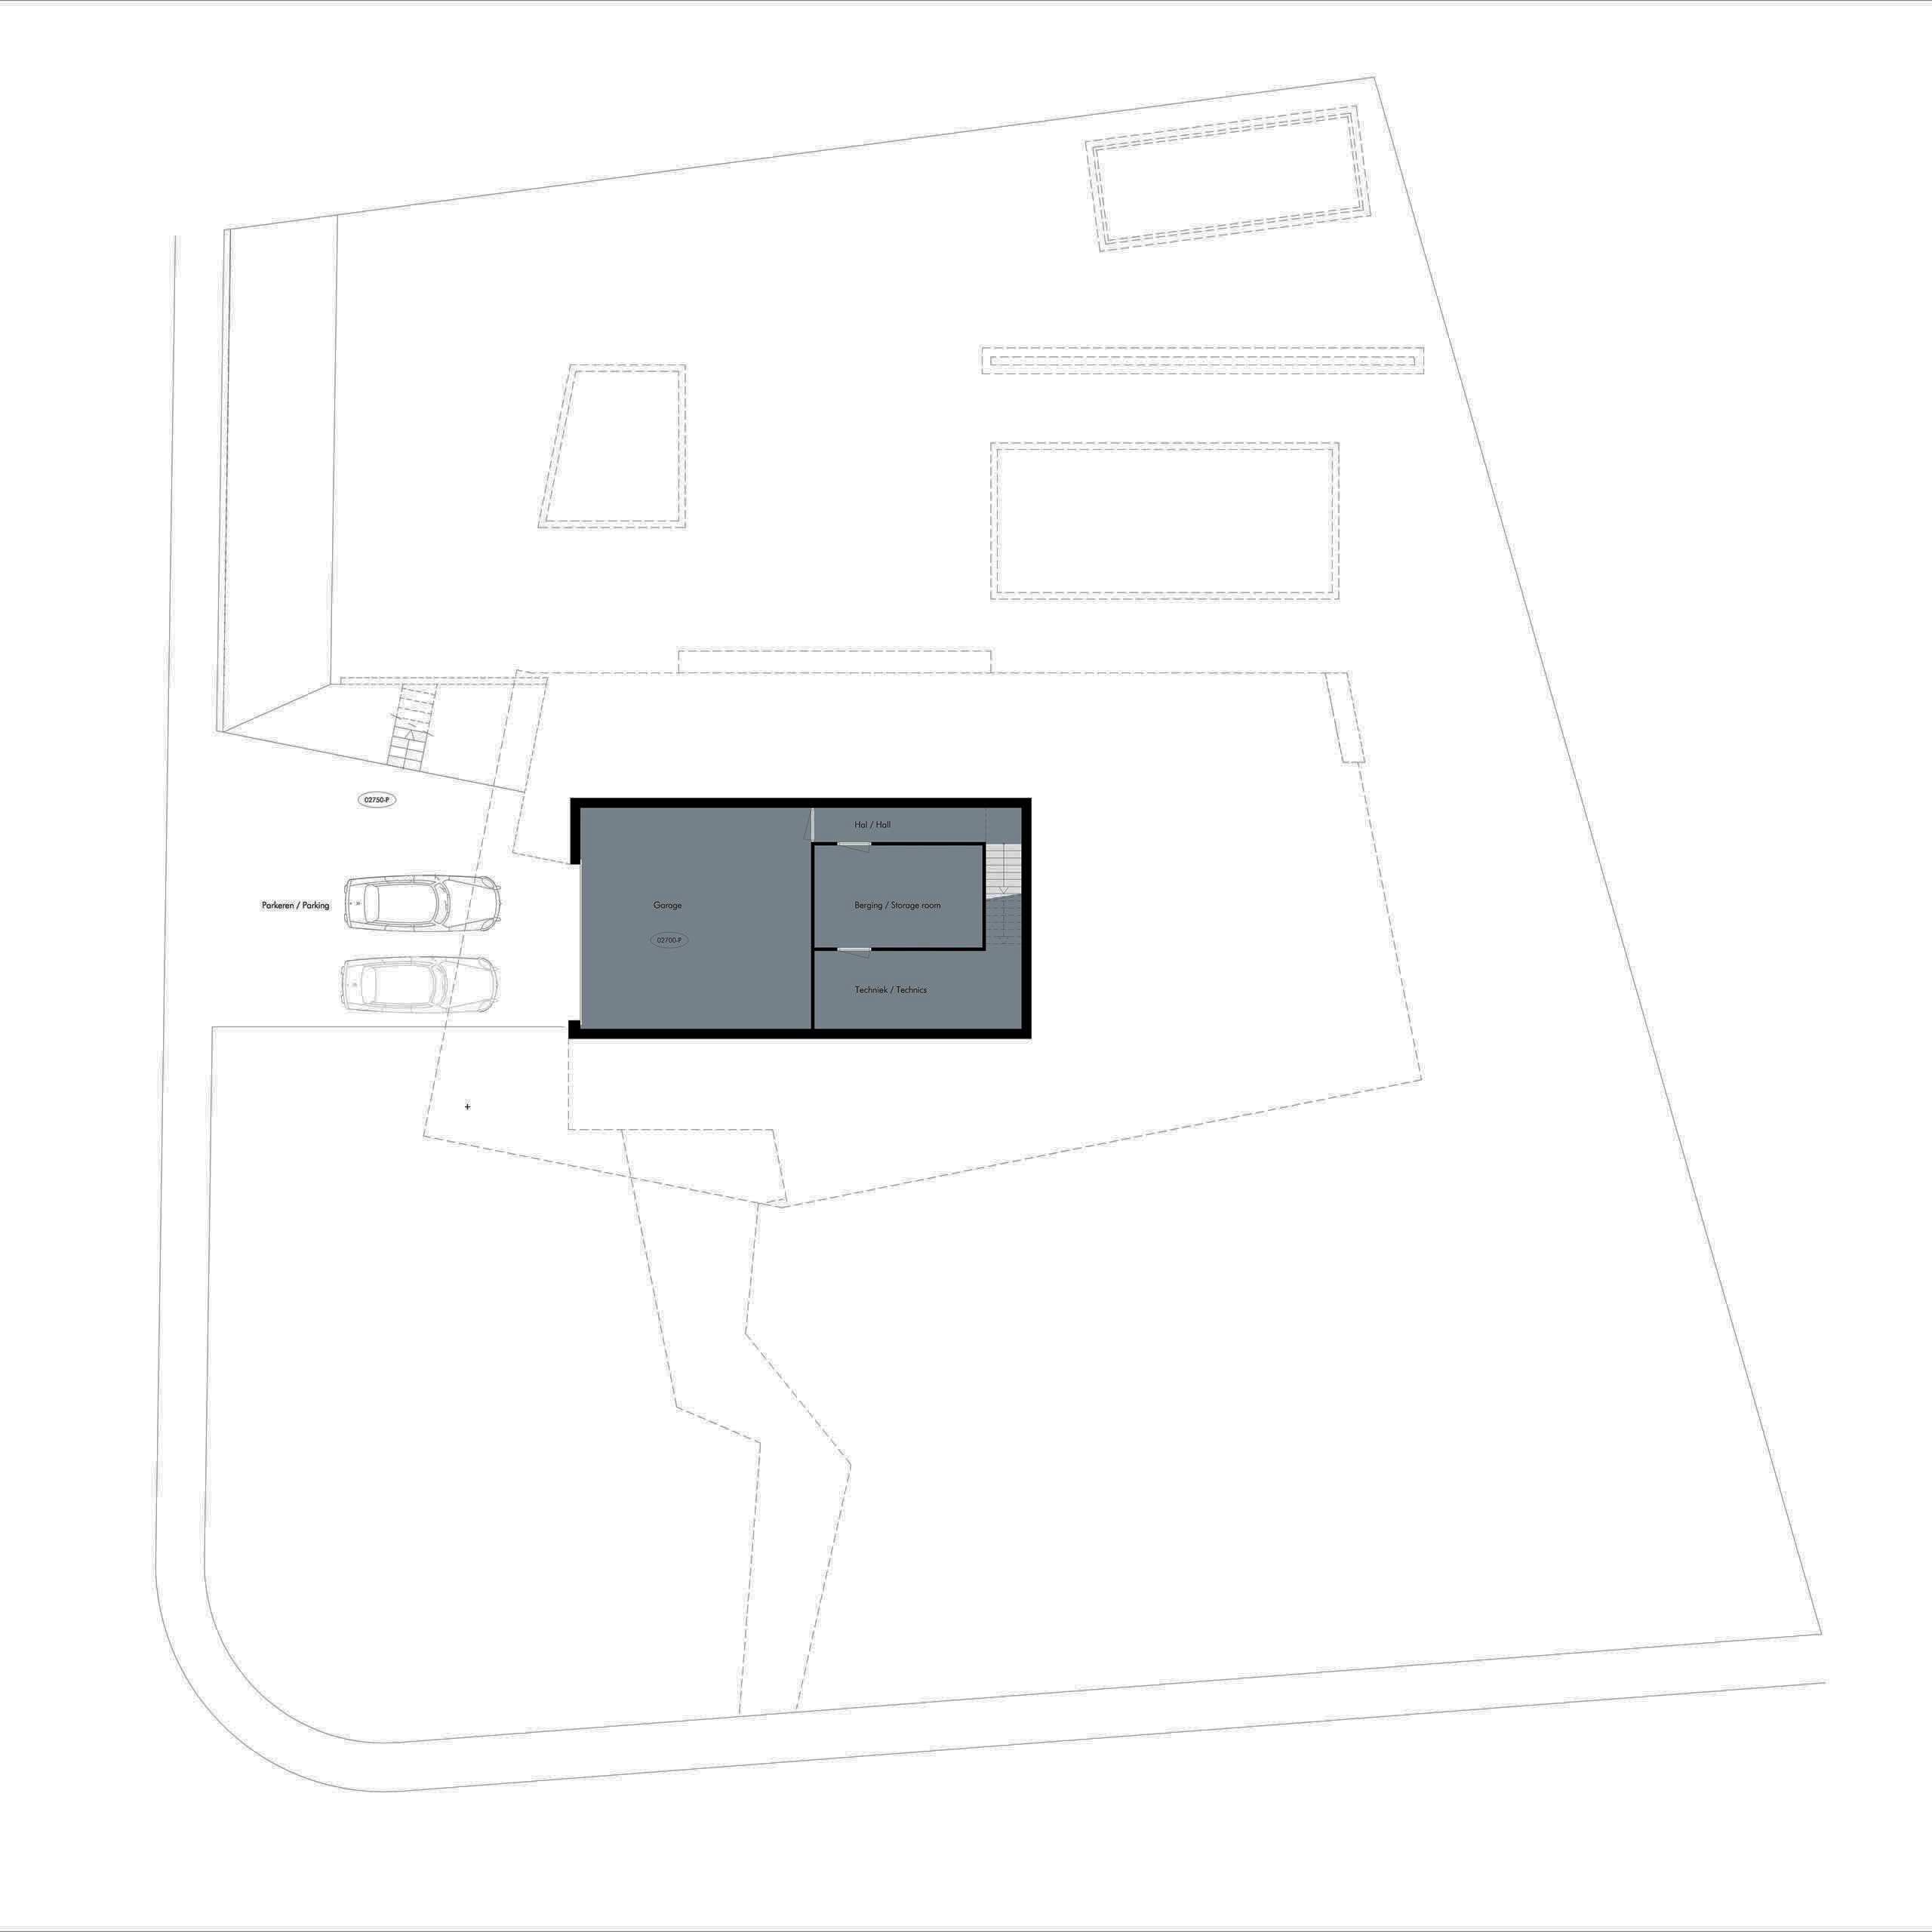 Boxed Villa Spee Haelen with Panoramic Windows by Lab32 architecten-31